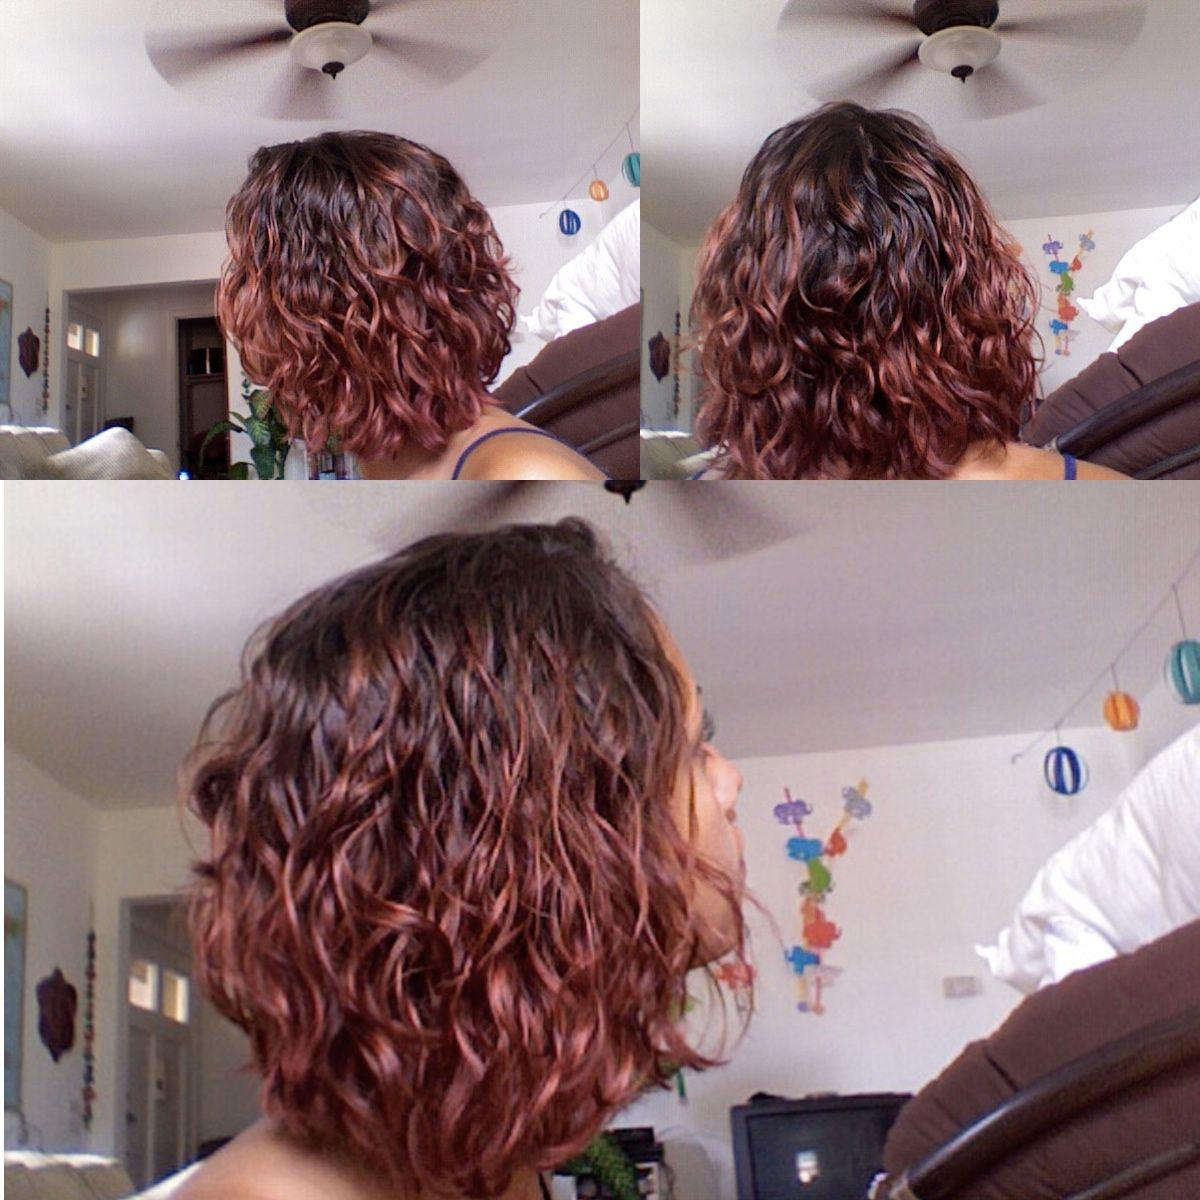 Pin By Rachel On Hair Hair Styles Short Hair Styles Curly Hair Styles